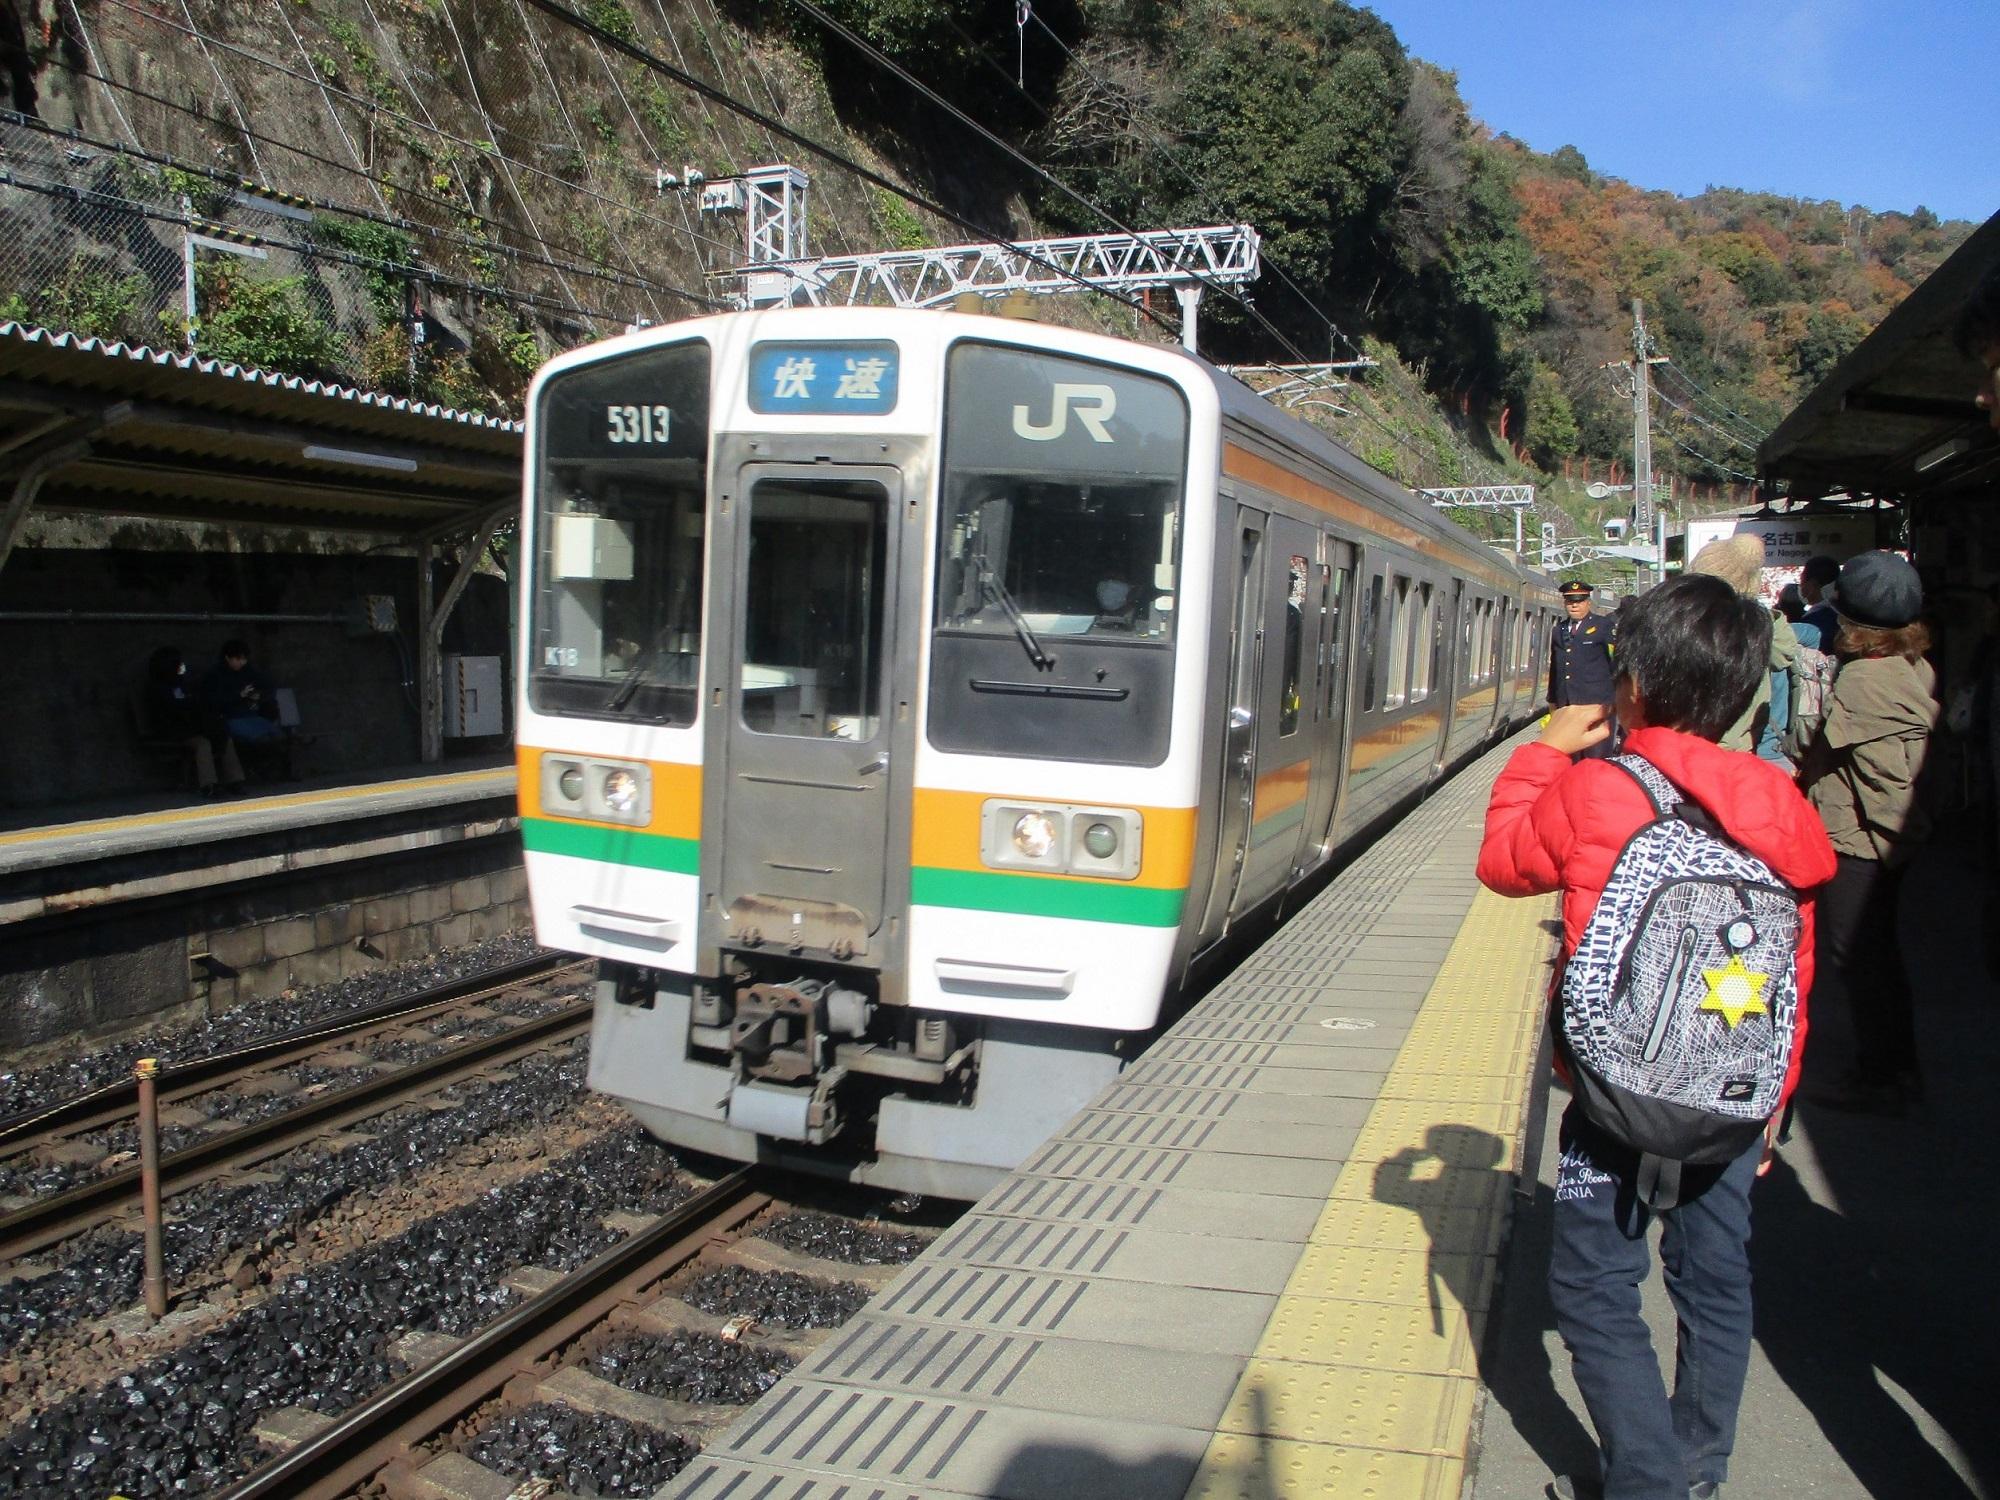 2019.12.1 (53) 定光寺 - 名古屋いき快速(臨時停車) 2000-1500